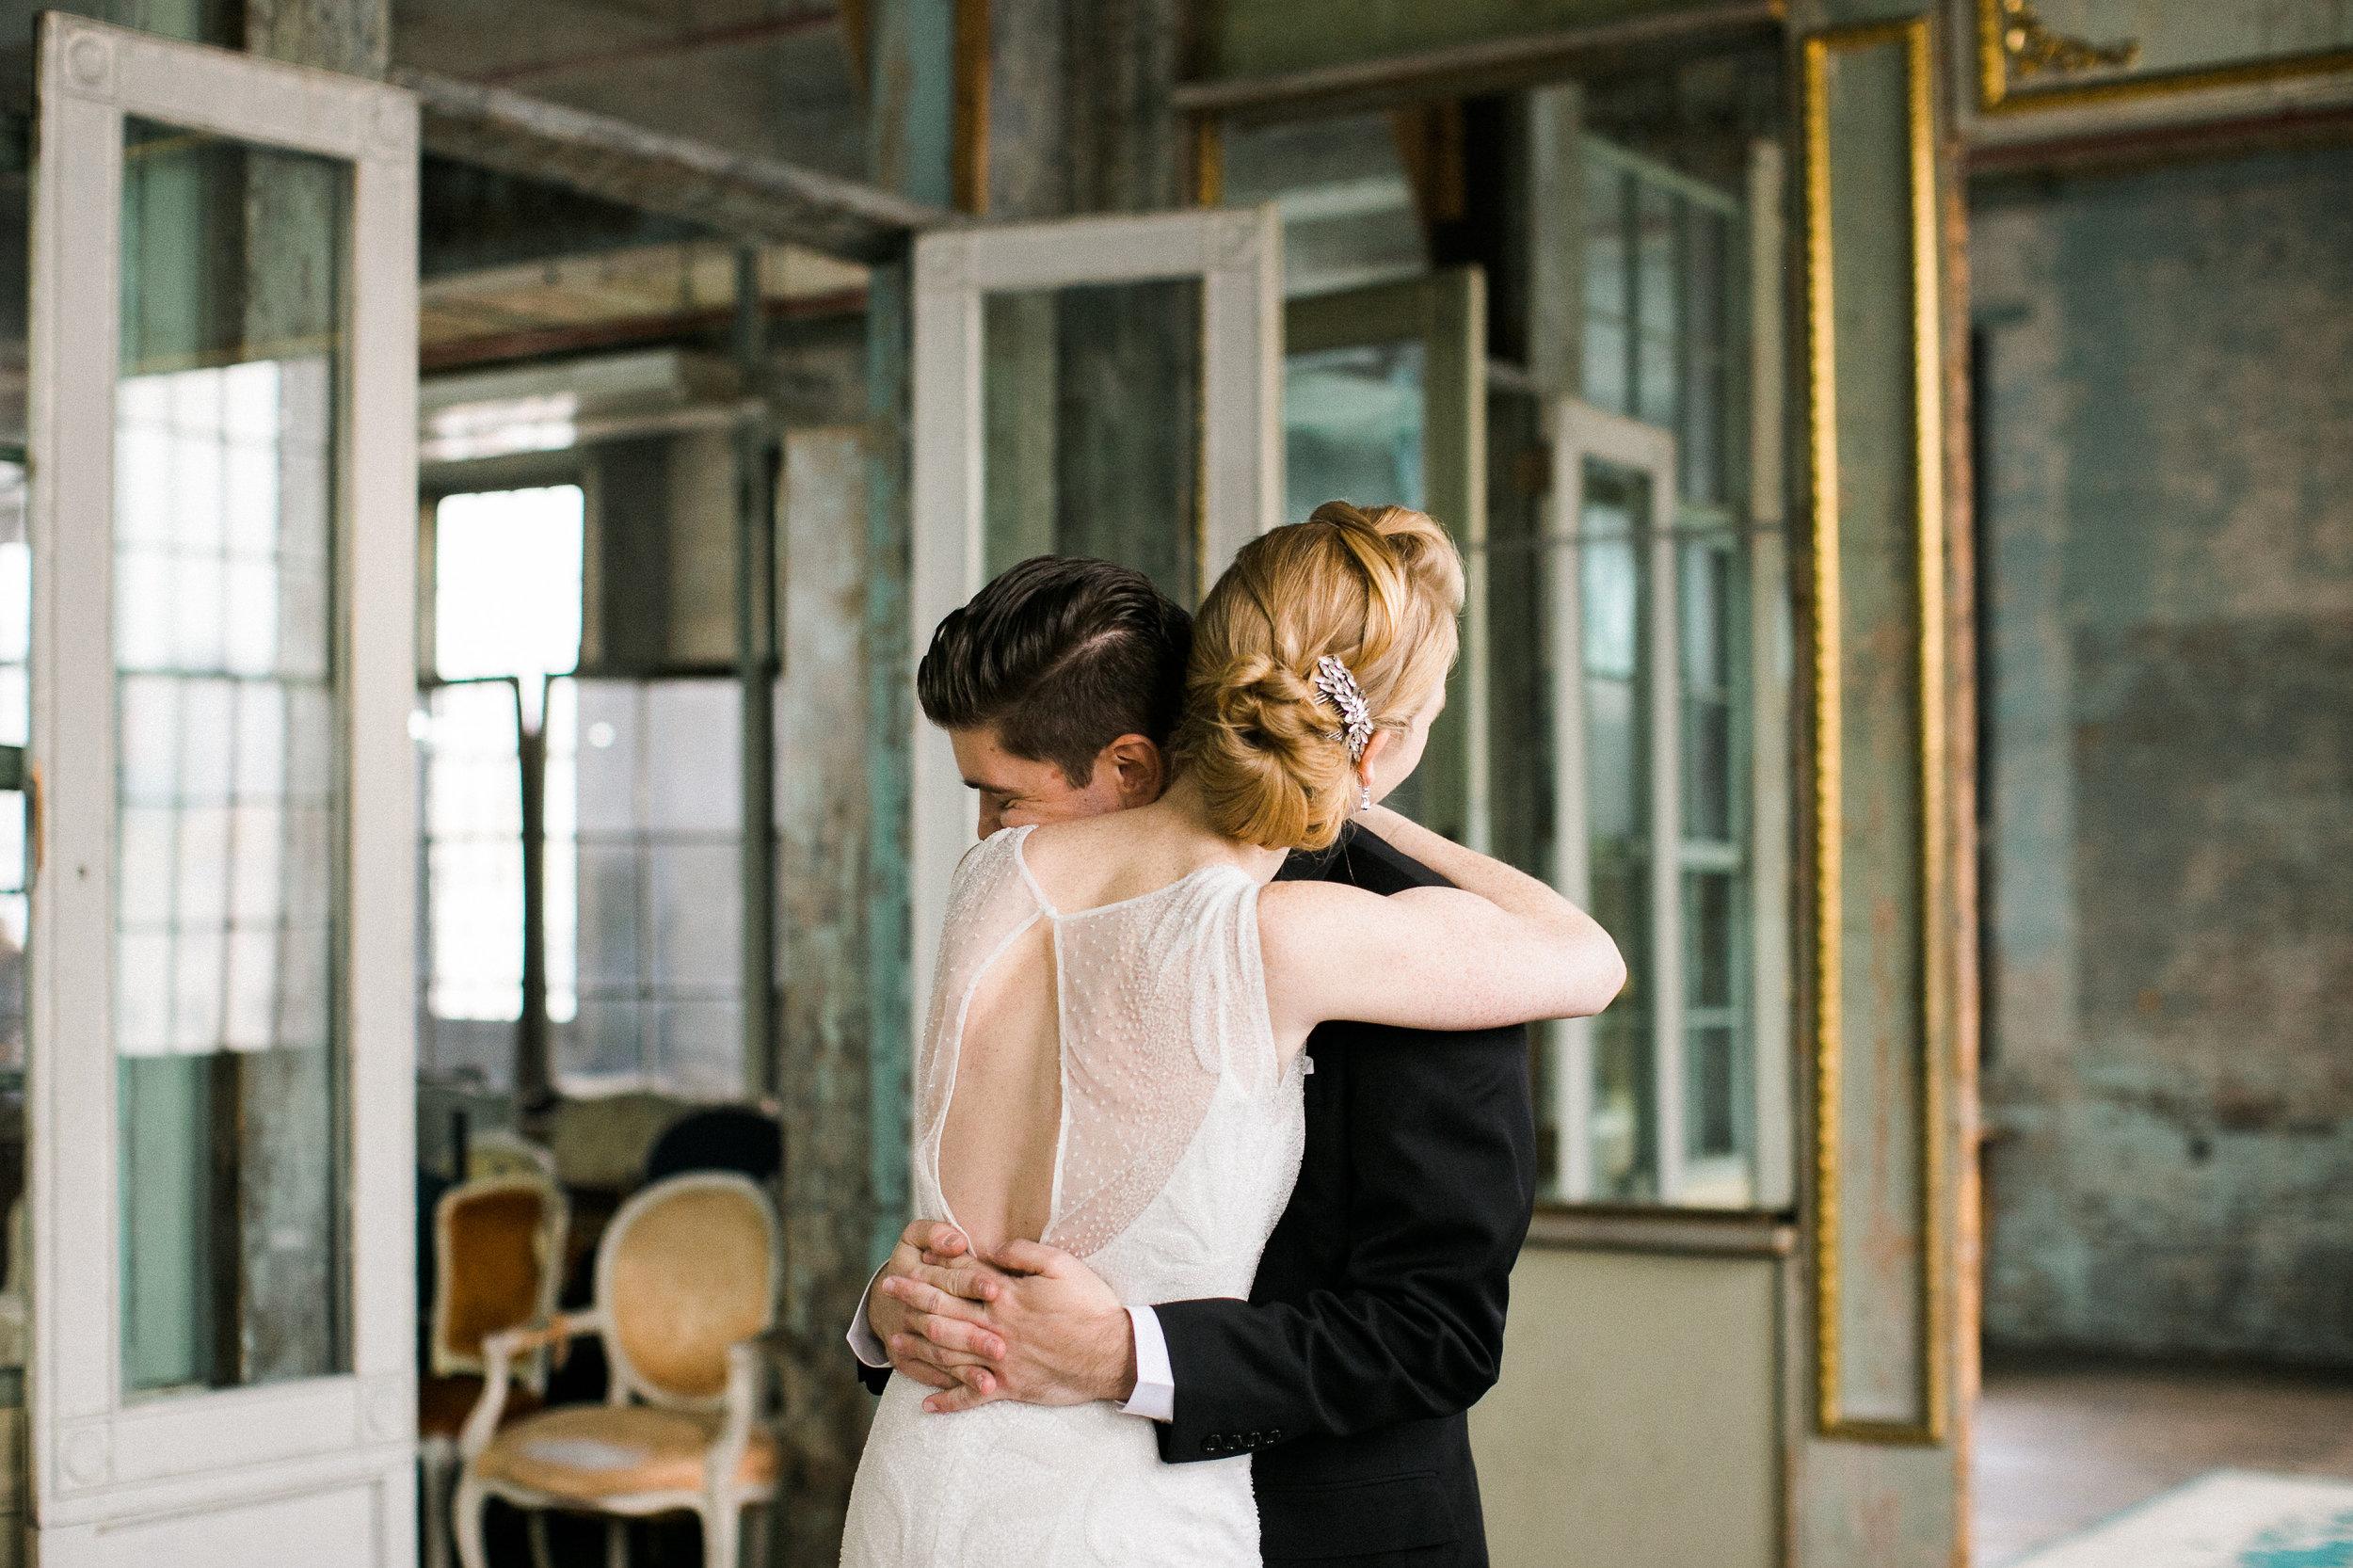 sam-and-jon_metropolitan-building-nyc-wedding-23-7.jpg